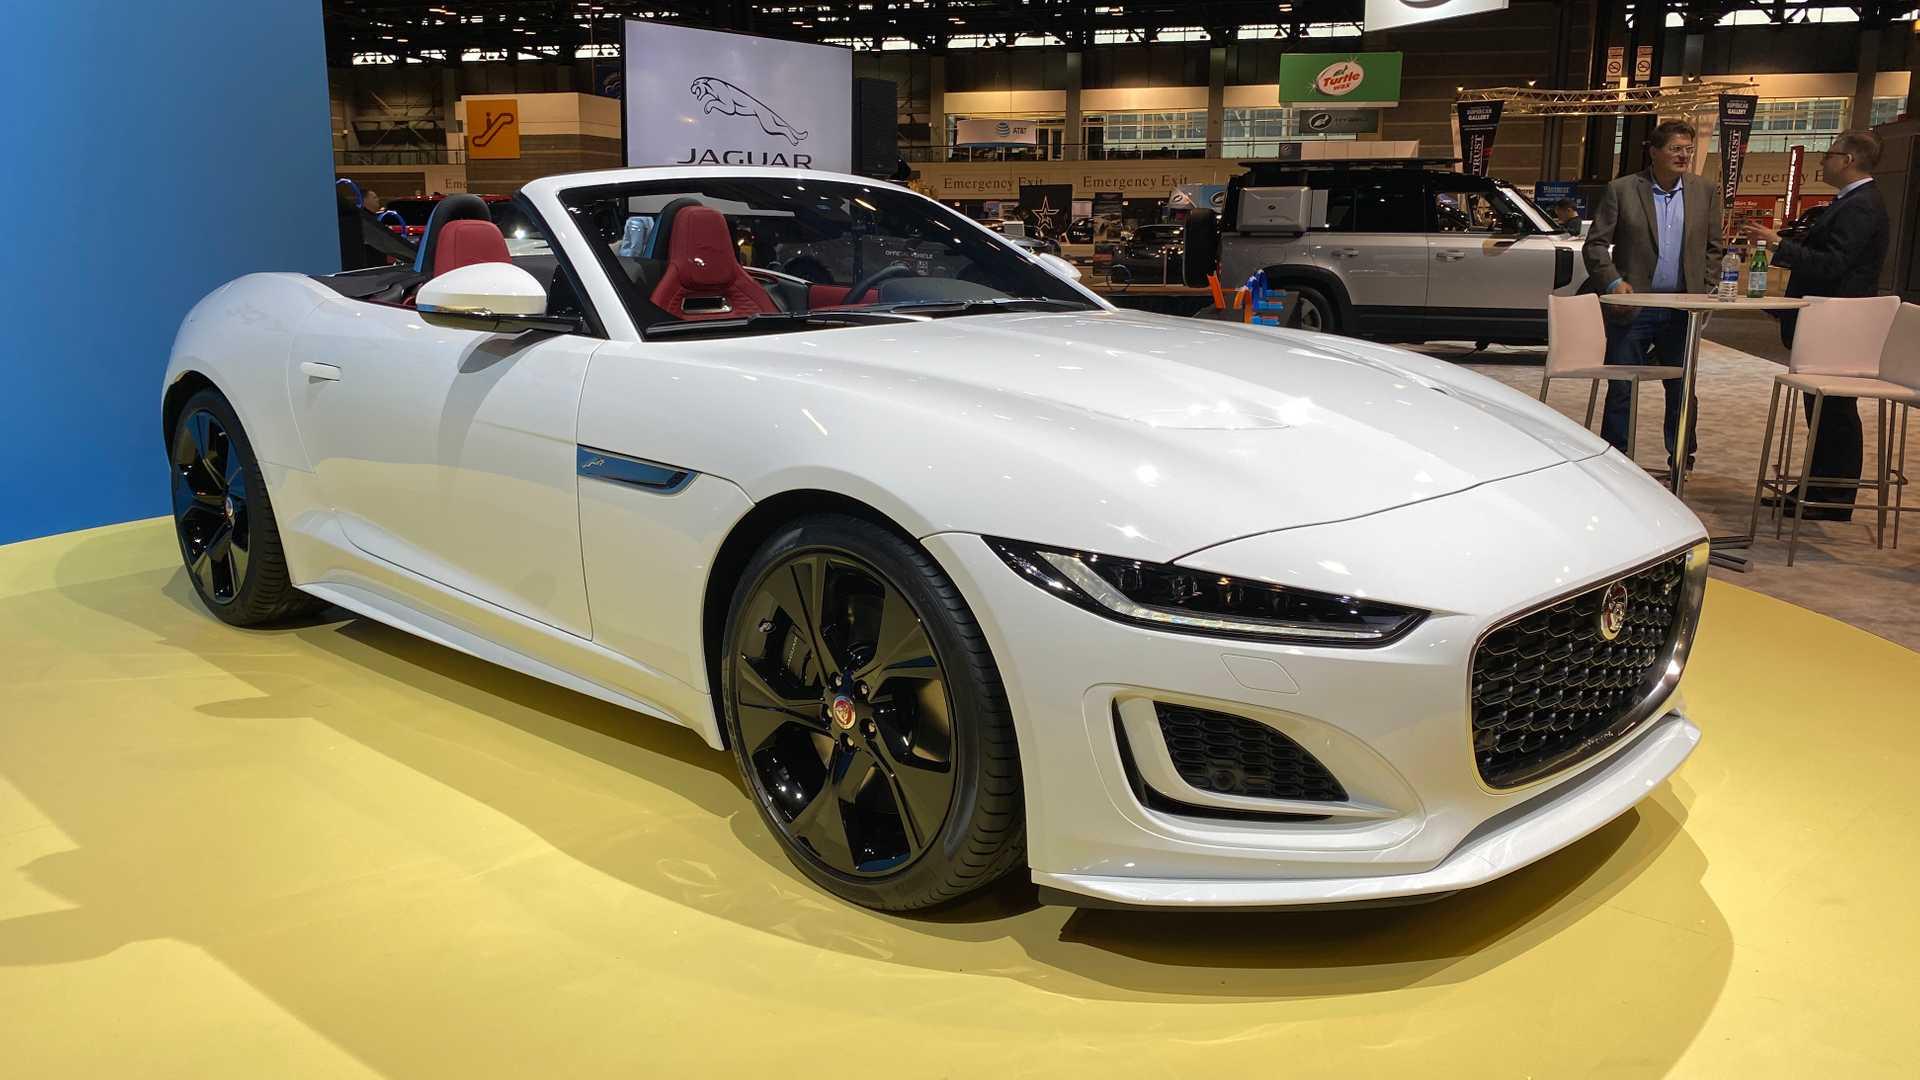 2021-jaguar-f-type-3.jpg